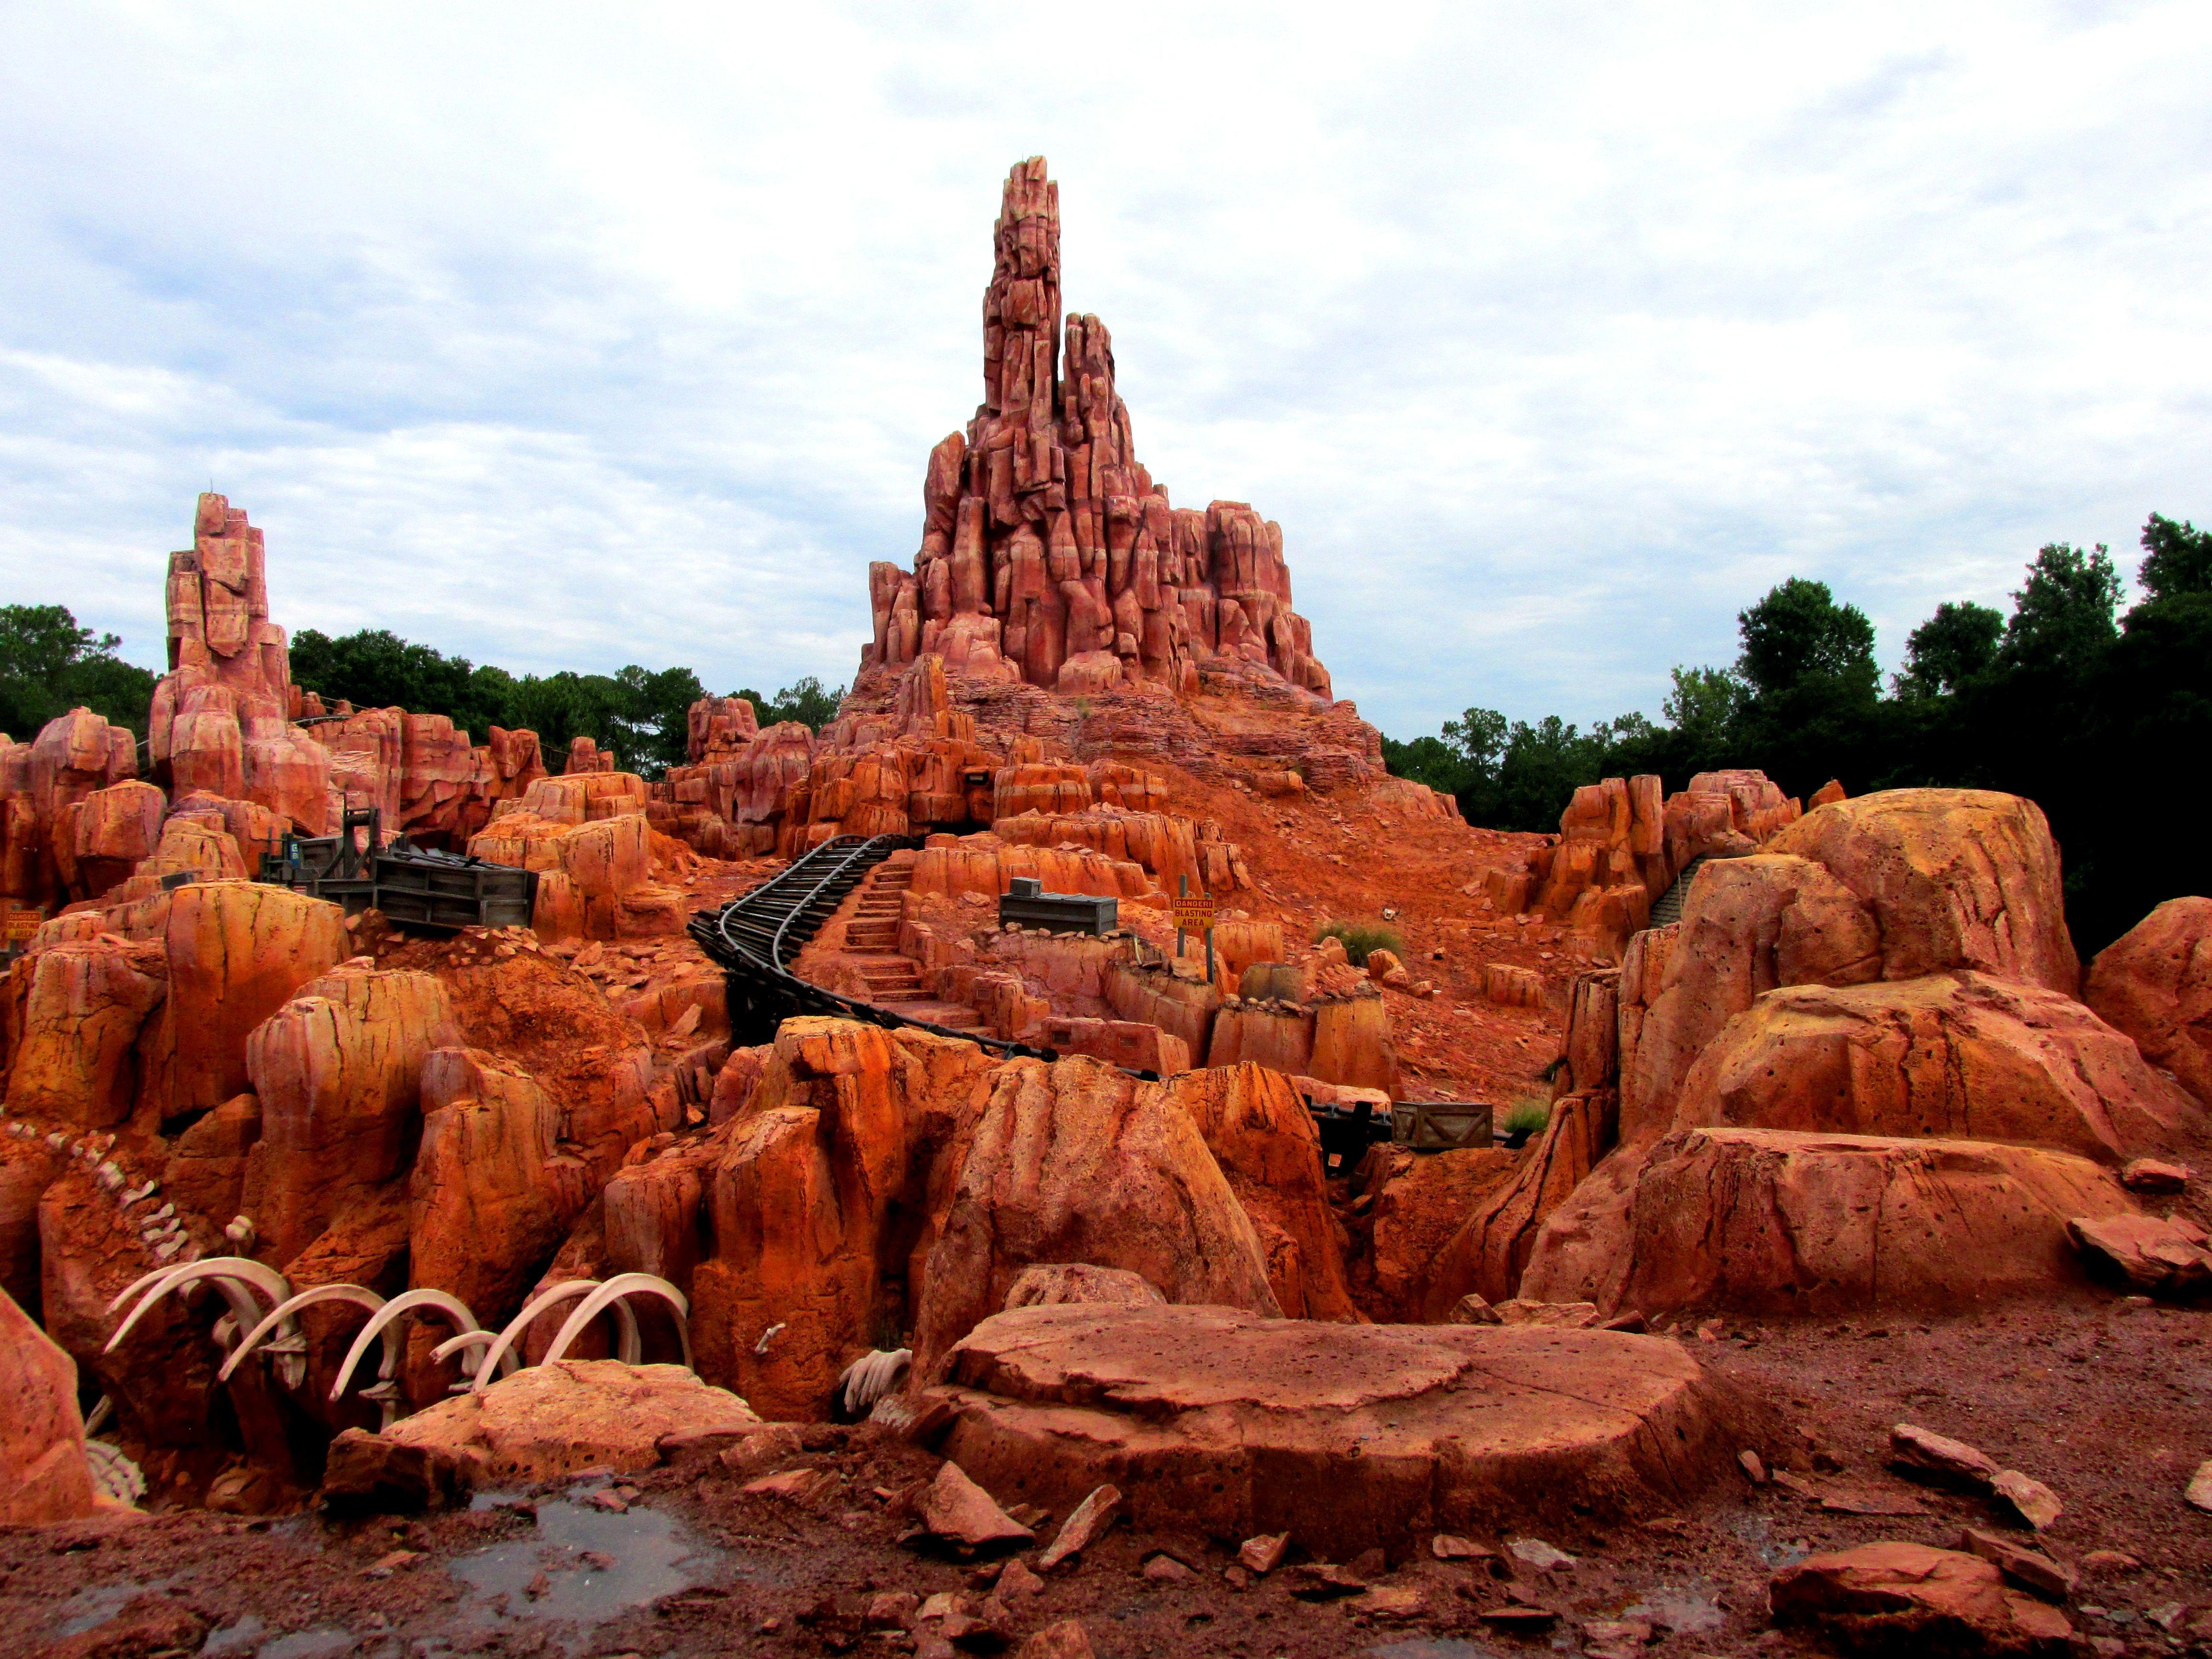 Helpful Information For Your September 2016 Disney World Vacation With Images Disney World Vacation Walt Disney World Vacations Disney World News